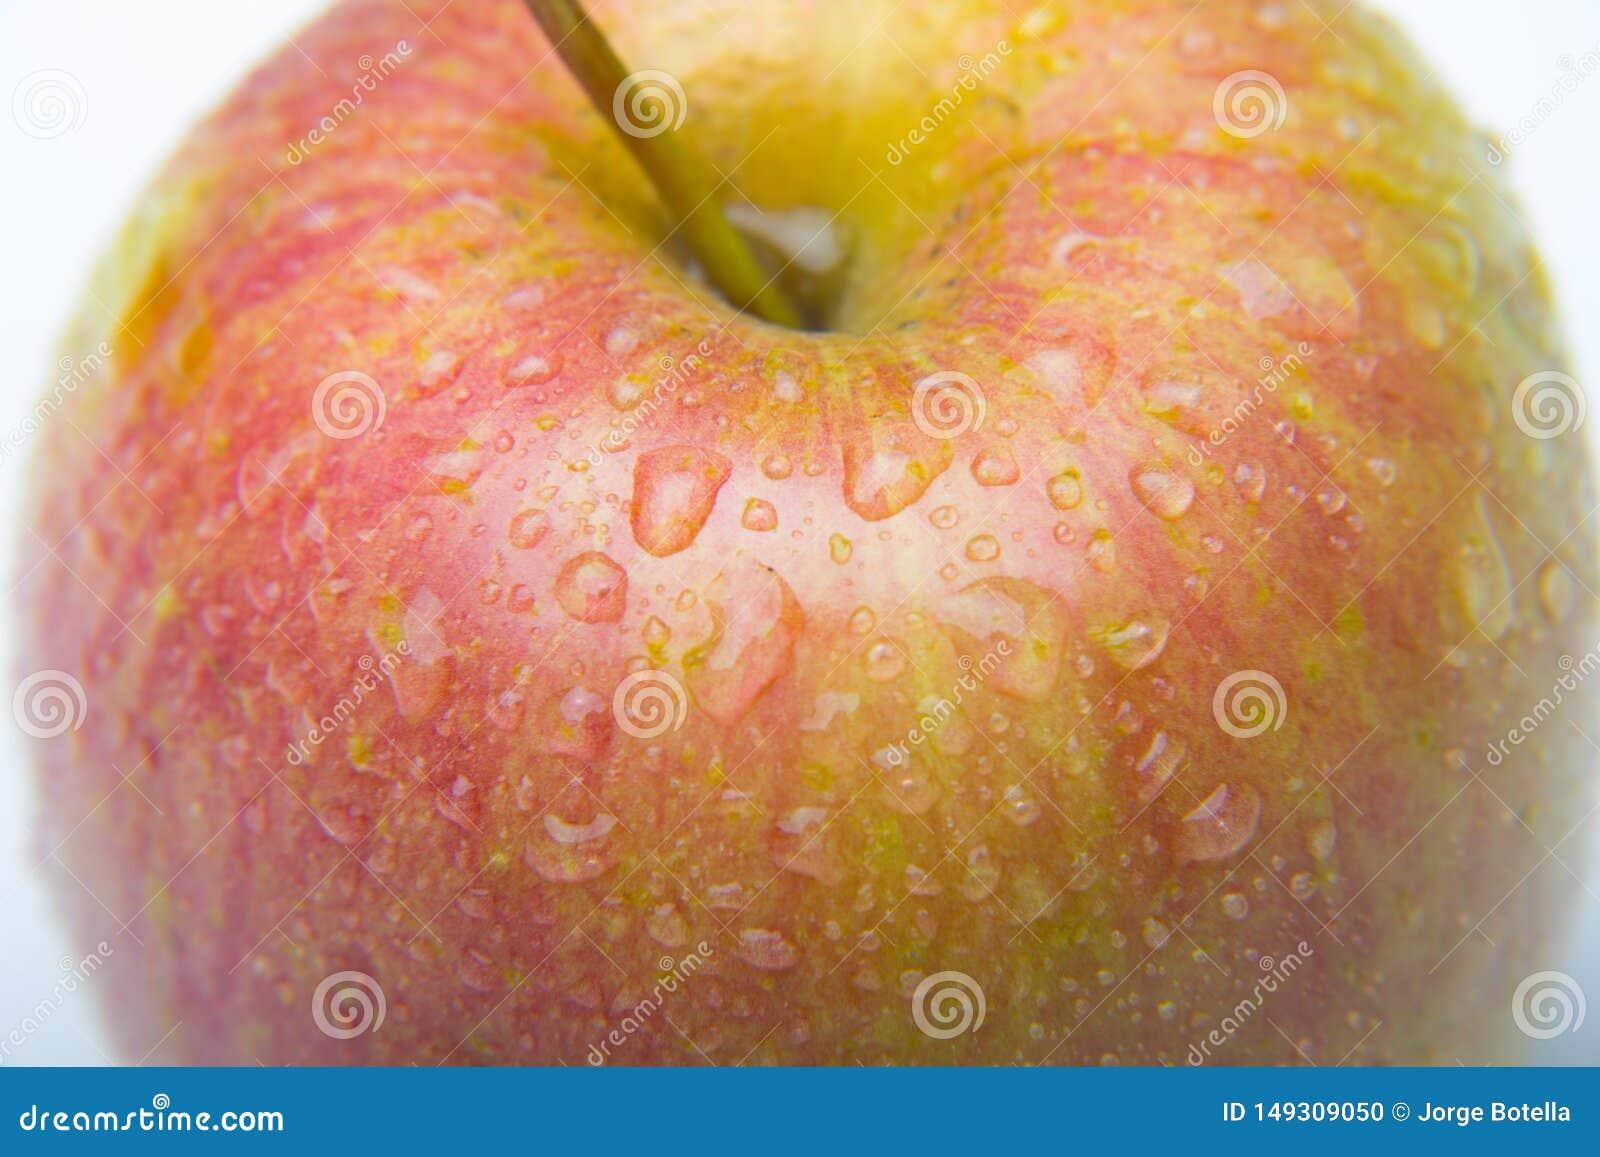 Manzana hermosa, sano, fresco y sano